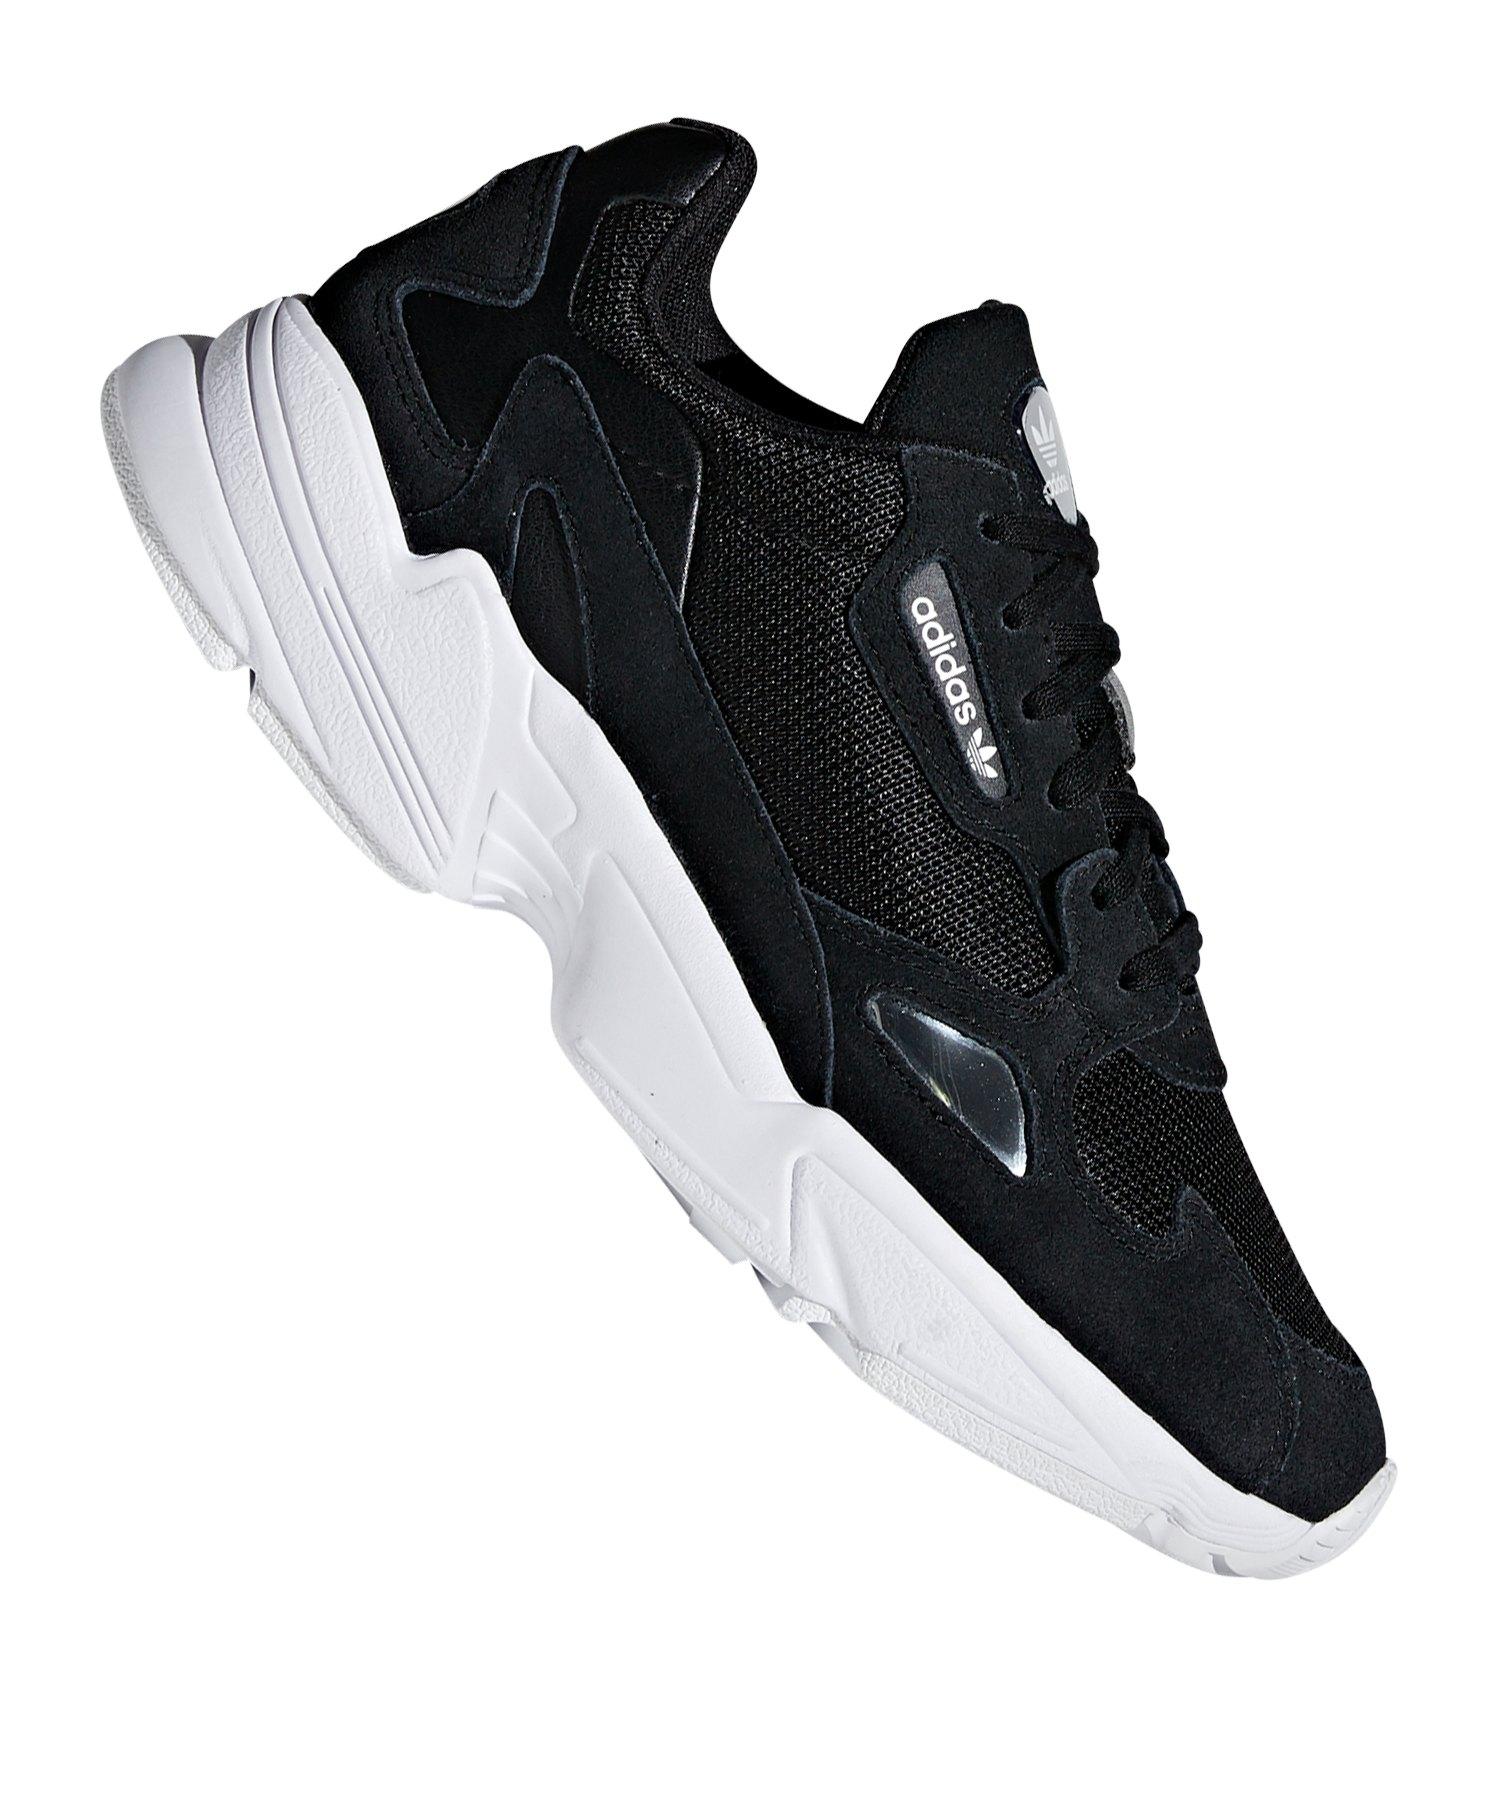 adidas Originals Falcon Sneaker Damen Schwarz